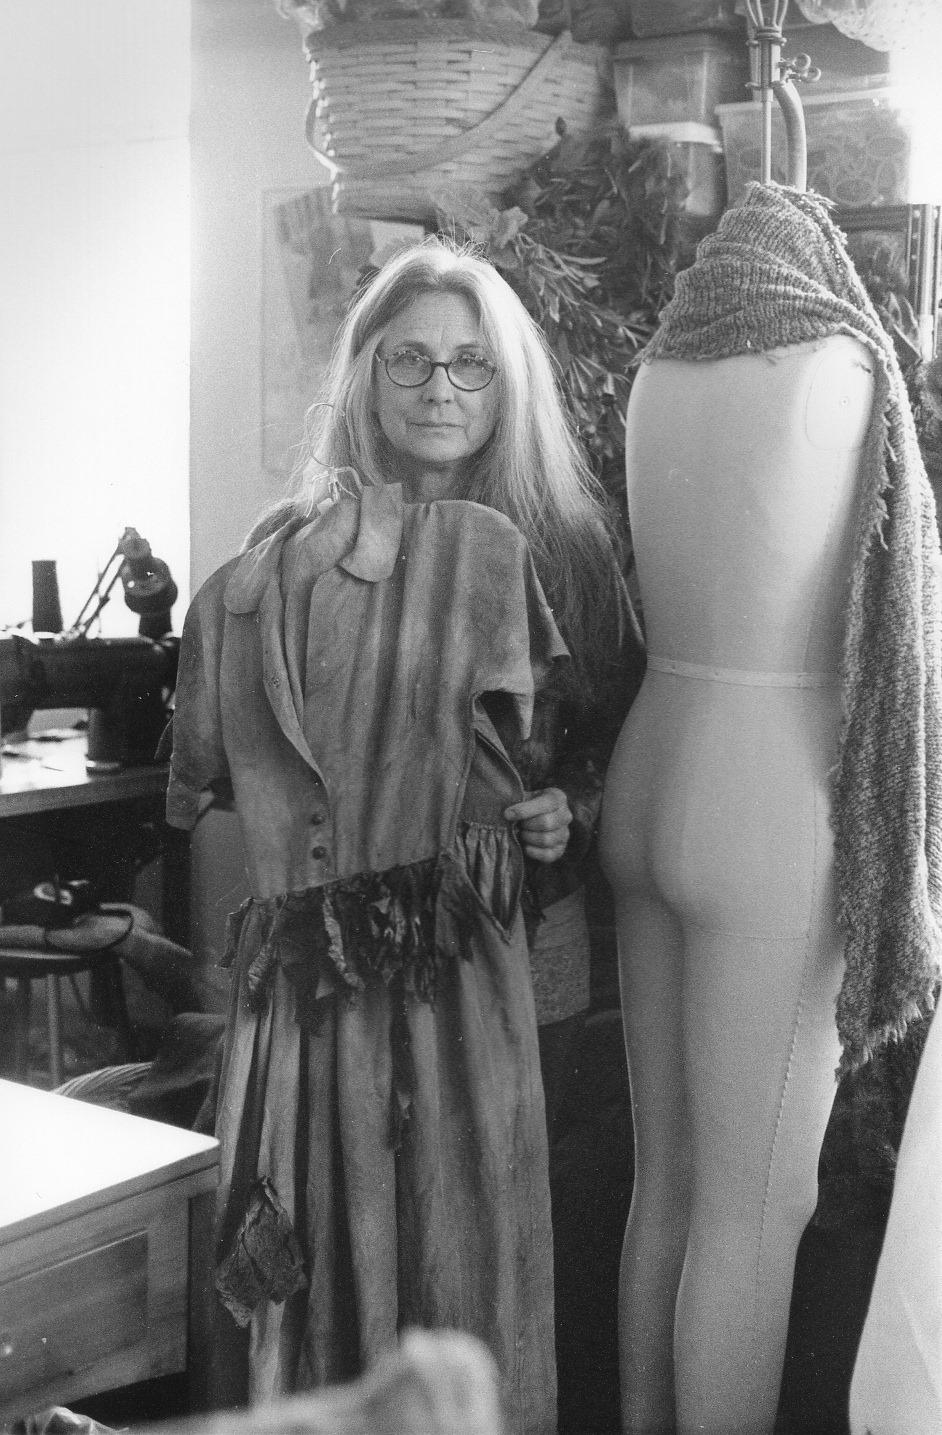 photographer / textile artist